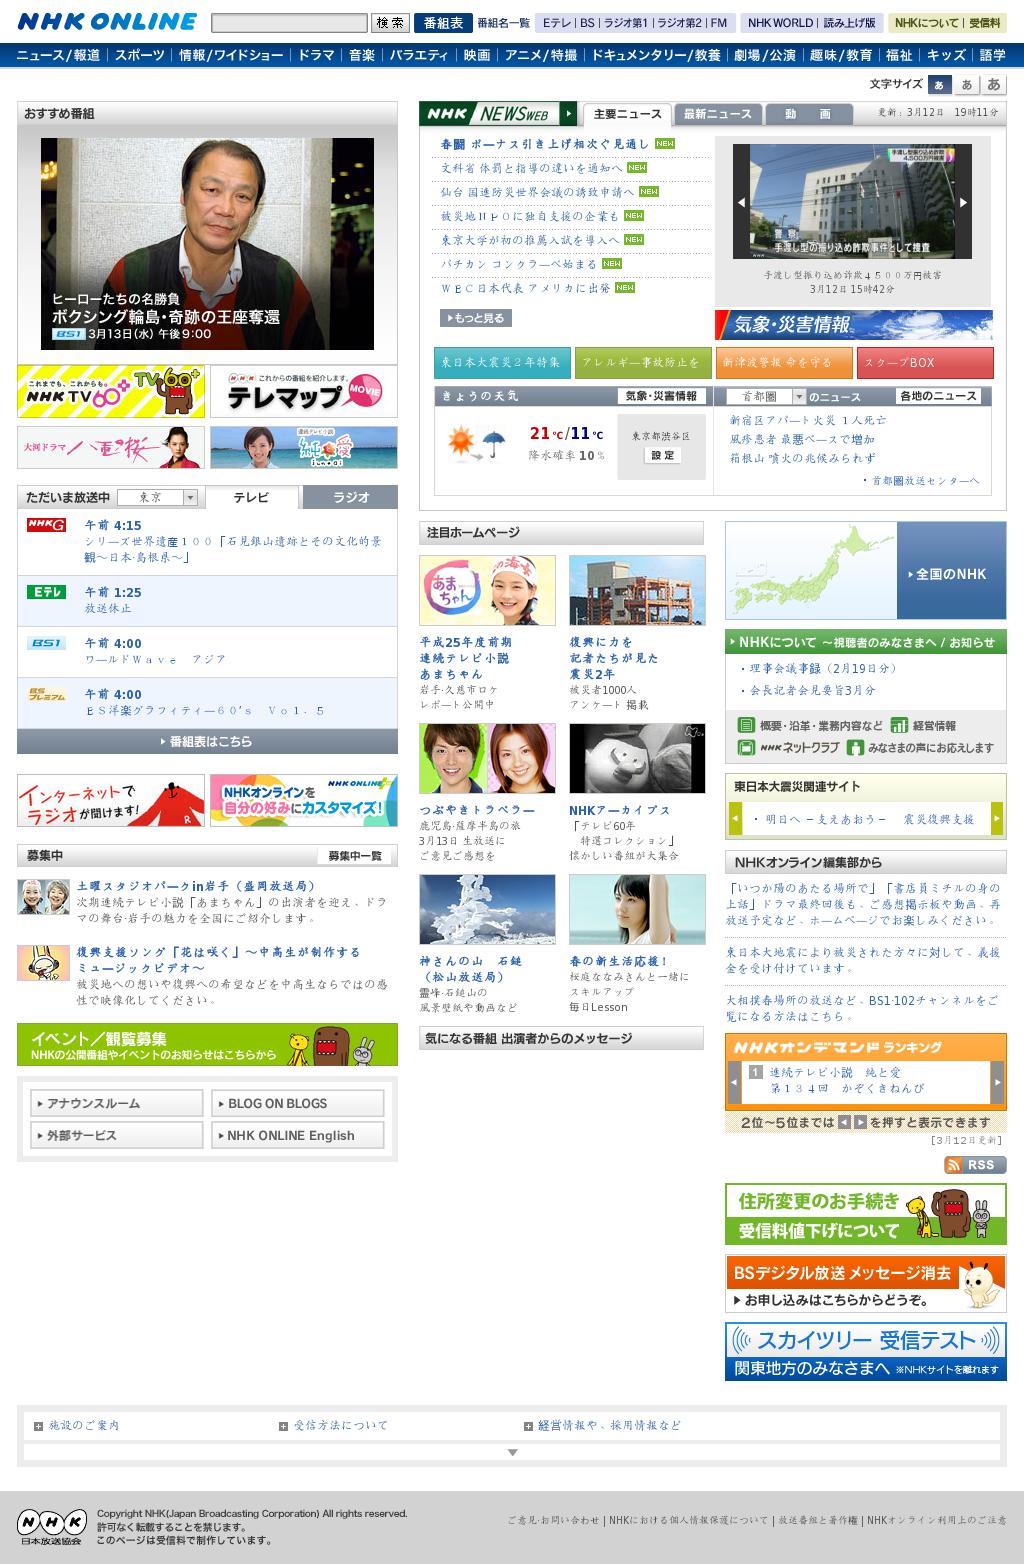 NHK Online at Tuesday March 12, 2013, 7:16 p.m. UTC